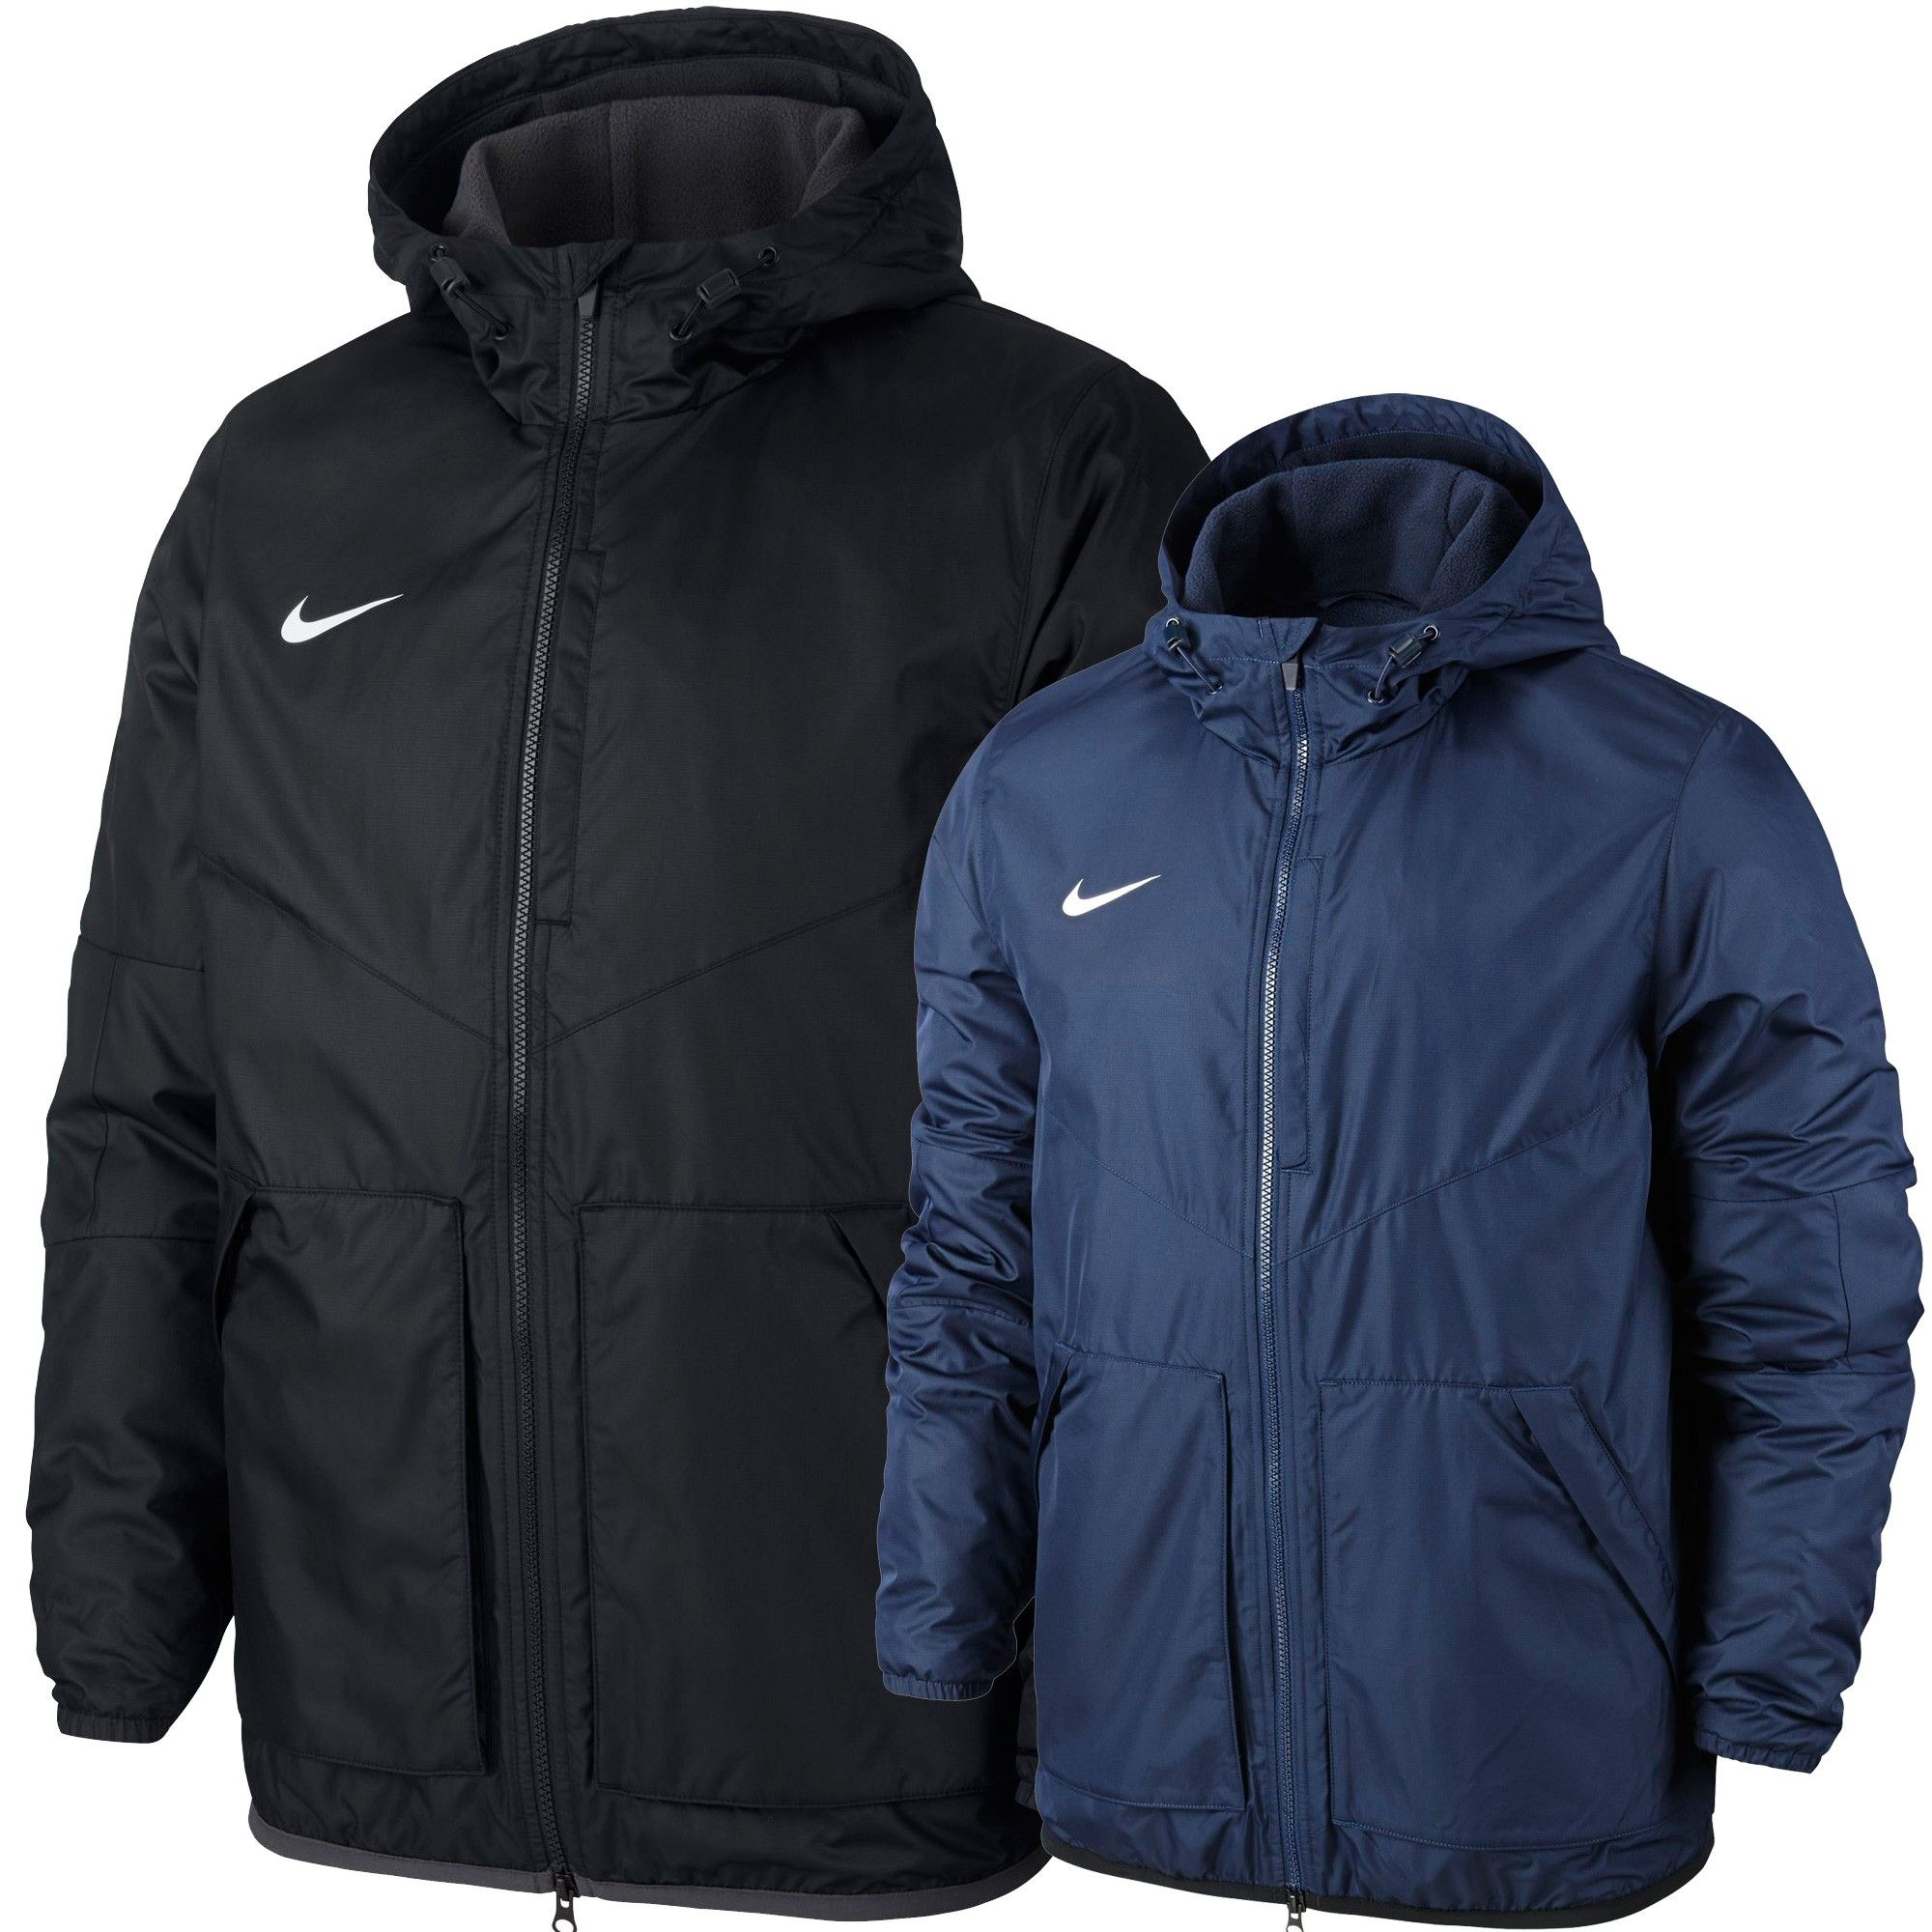 Veste Team Fall Nike